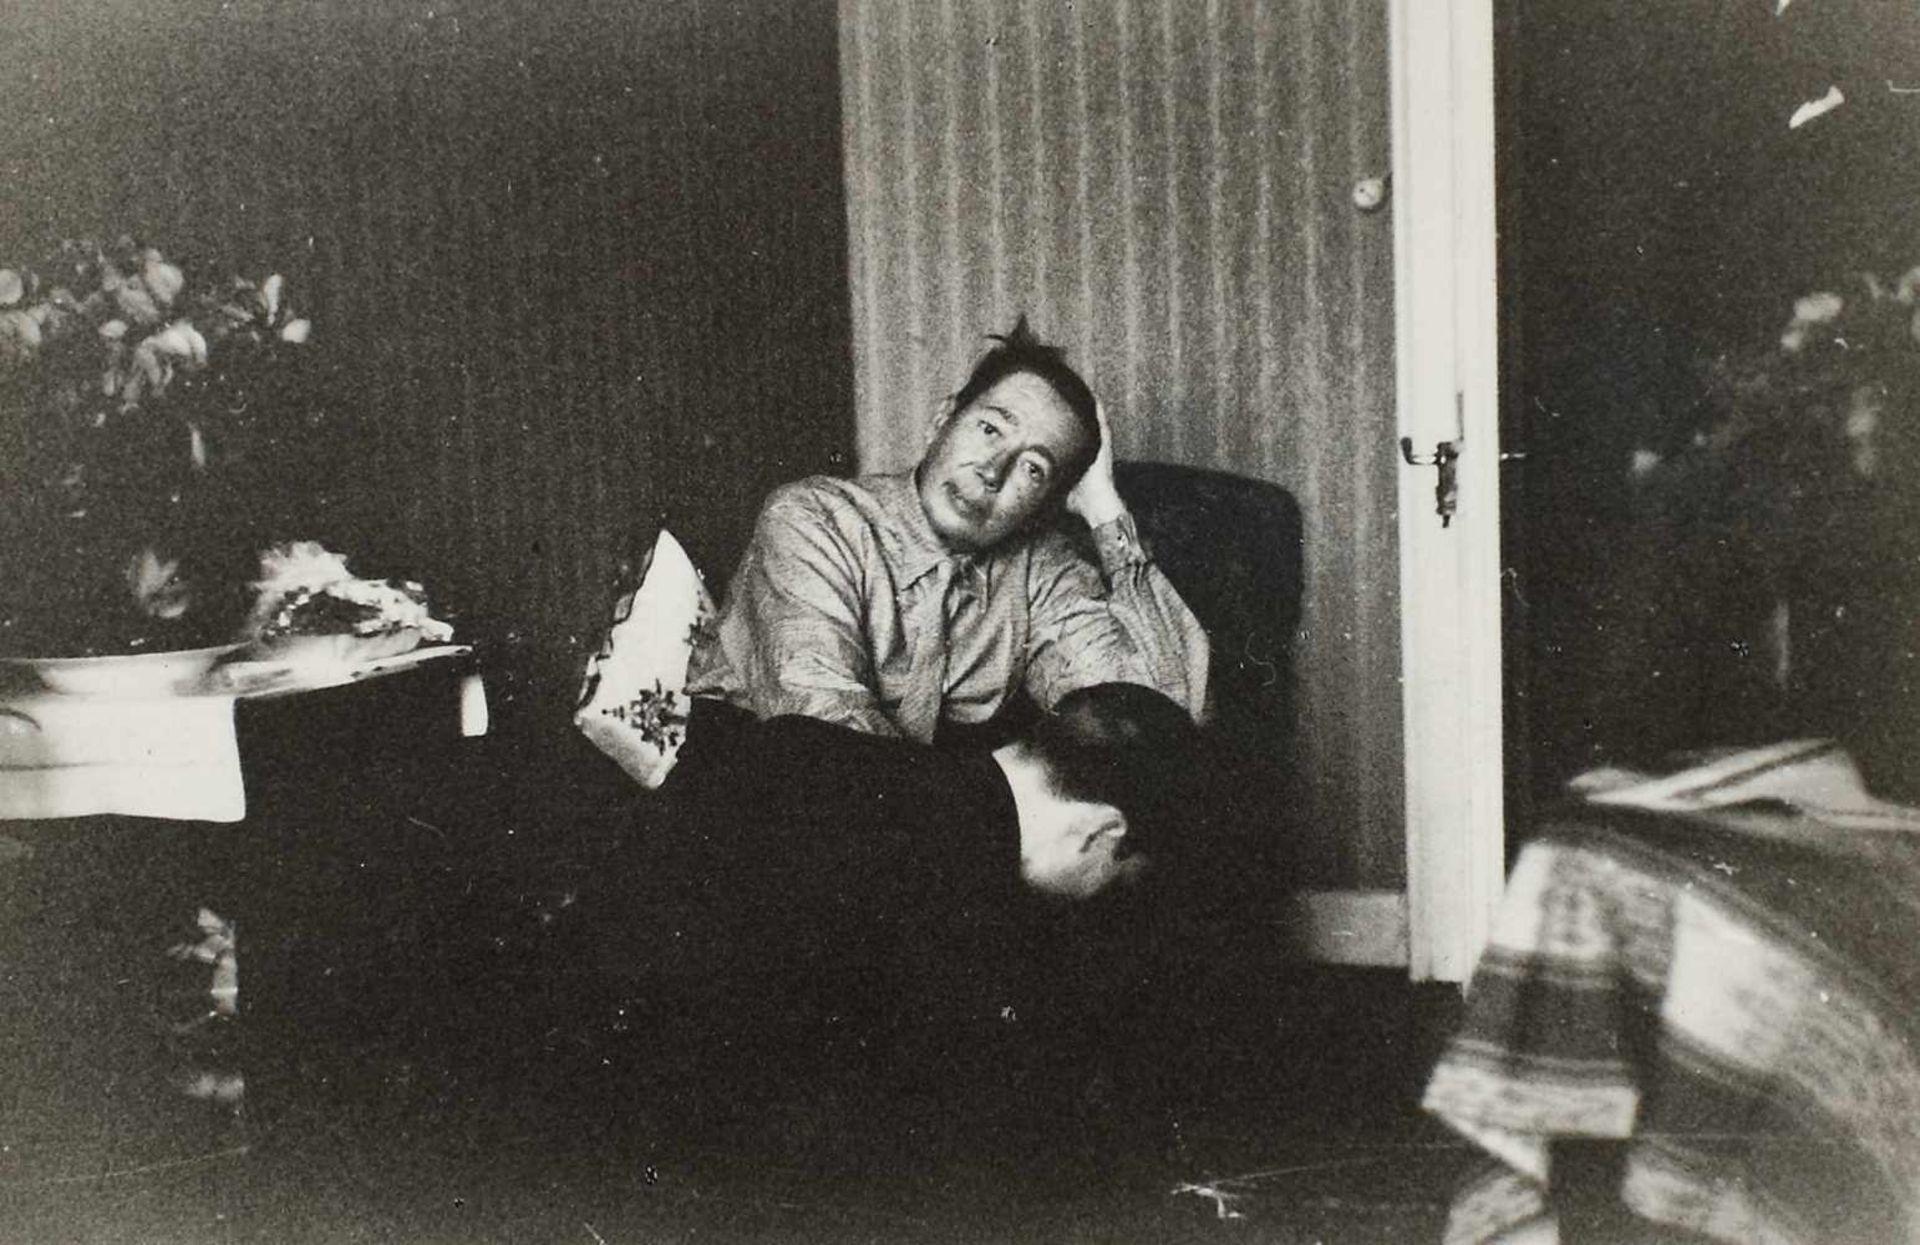 Seven photos illustrating Nicolae Titulescu, approx. 1940 - Bild 6 aus 8